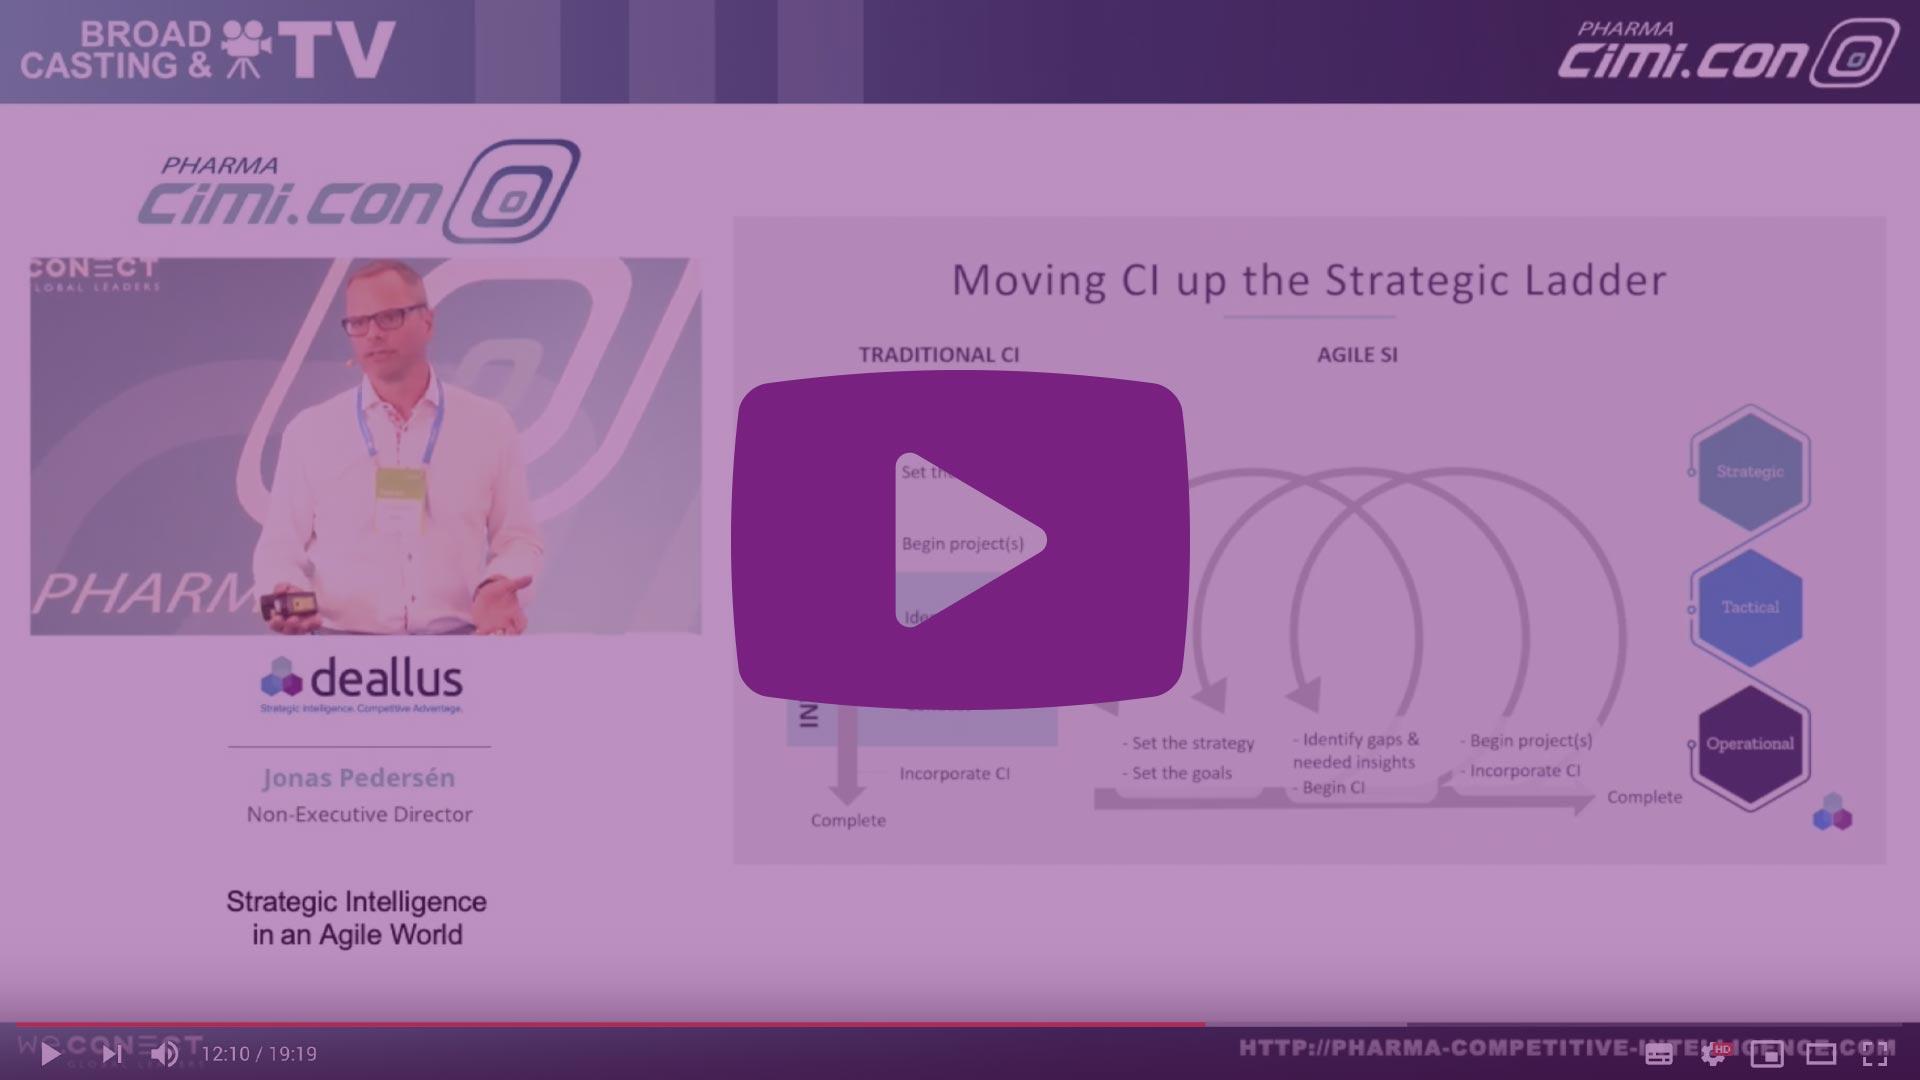 Deallus Keynote at Pharma CiMi.CON EU 2019